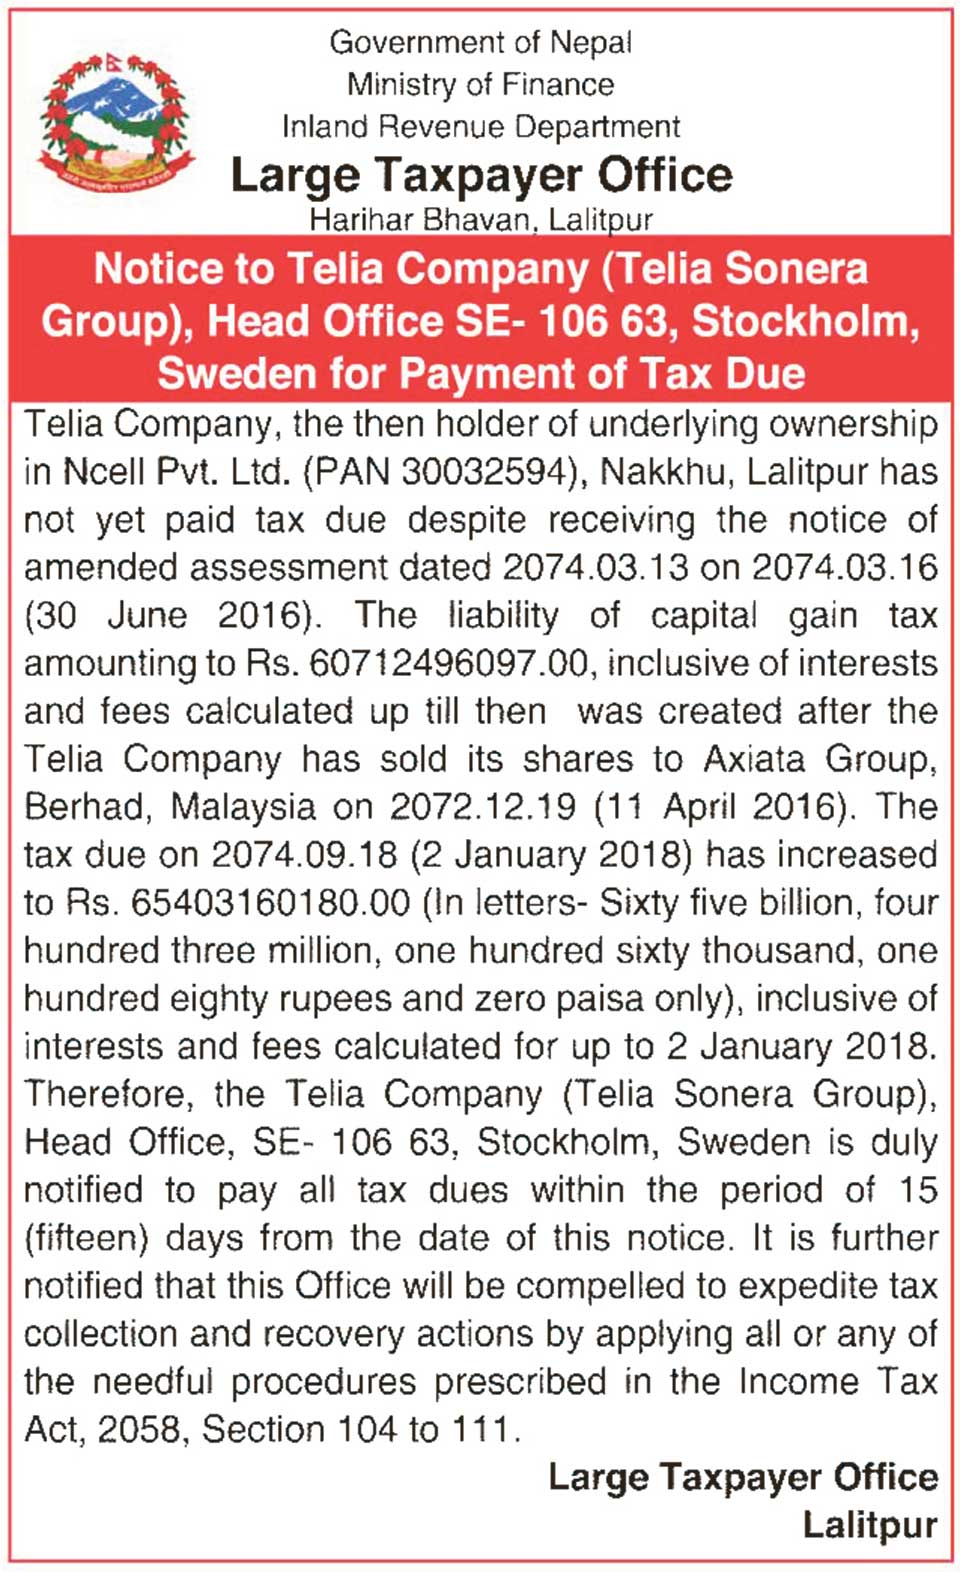 LTO publishes public notice asking Telia to settle CGT dues